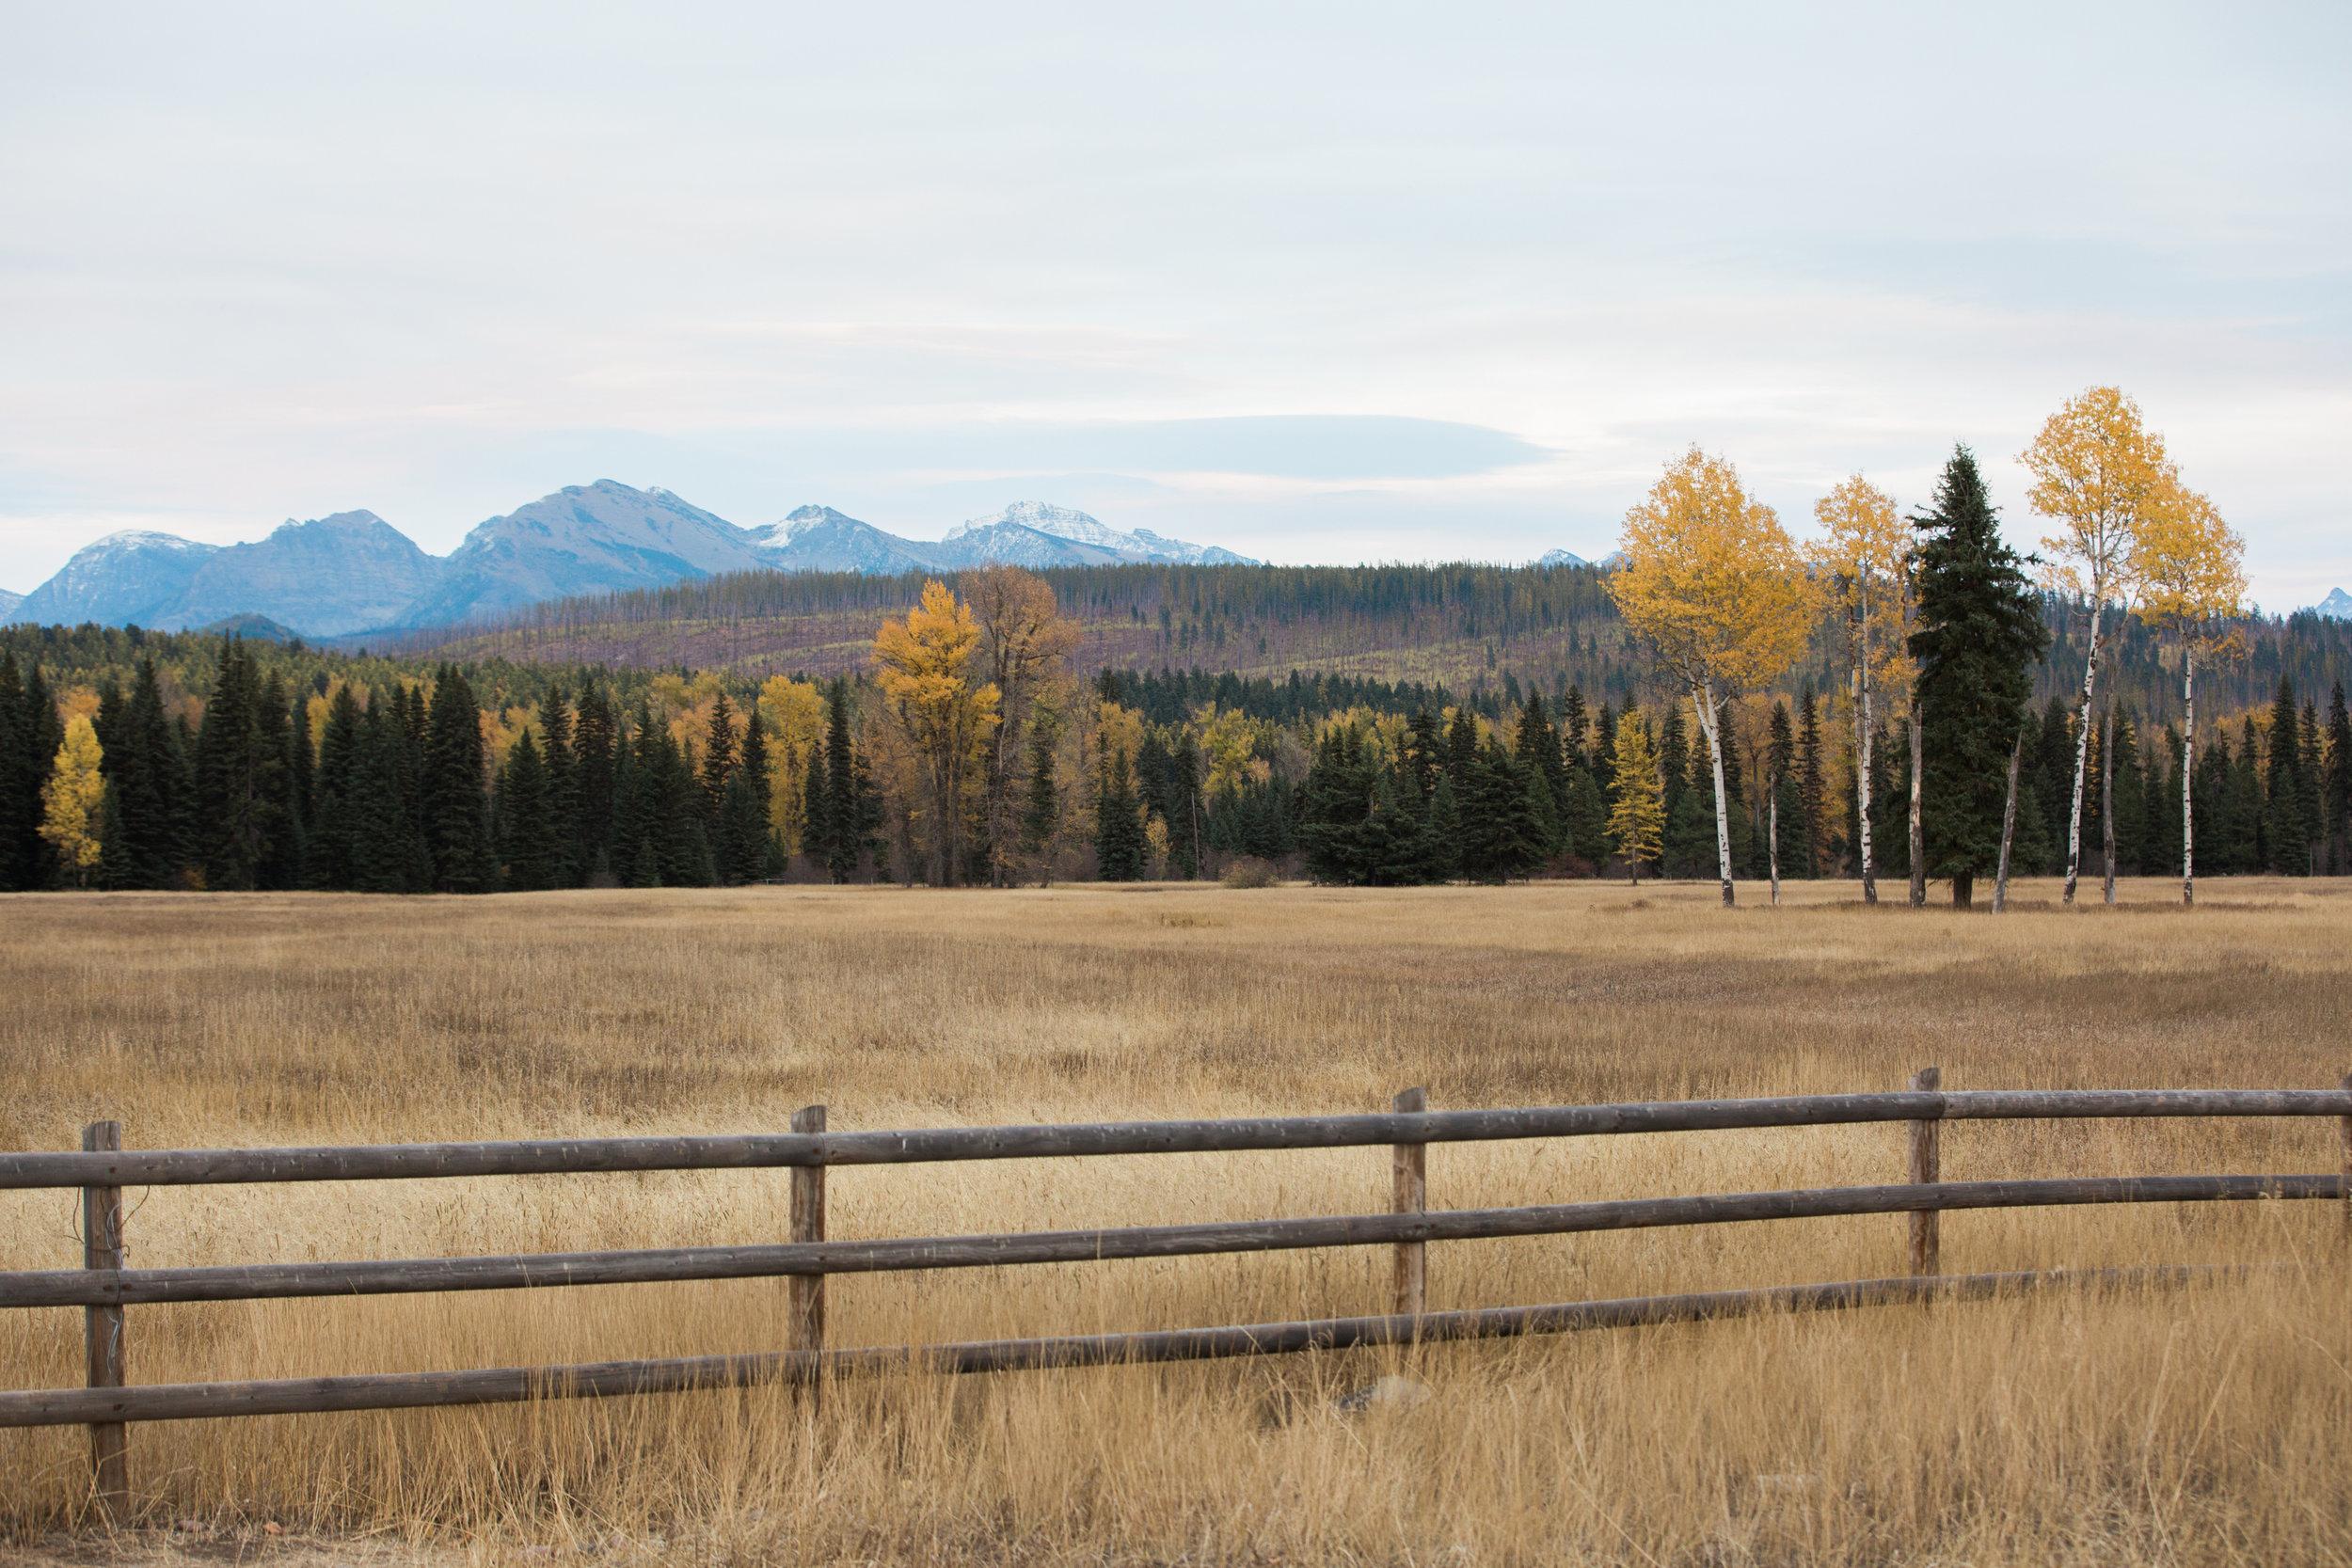 CindyGiovagnoli_Glacier_National_Park_Montana_mountains_lake_fall_autumn_road_trip-037.jpg